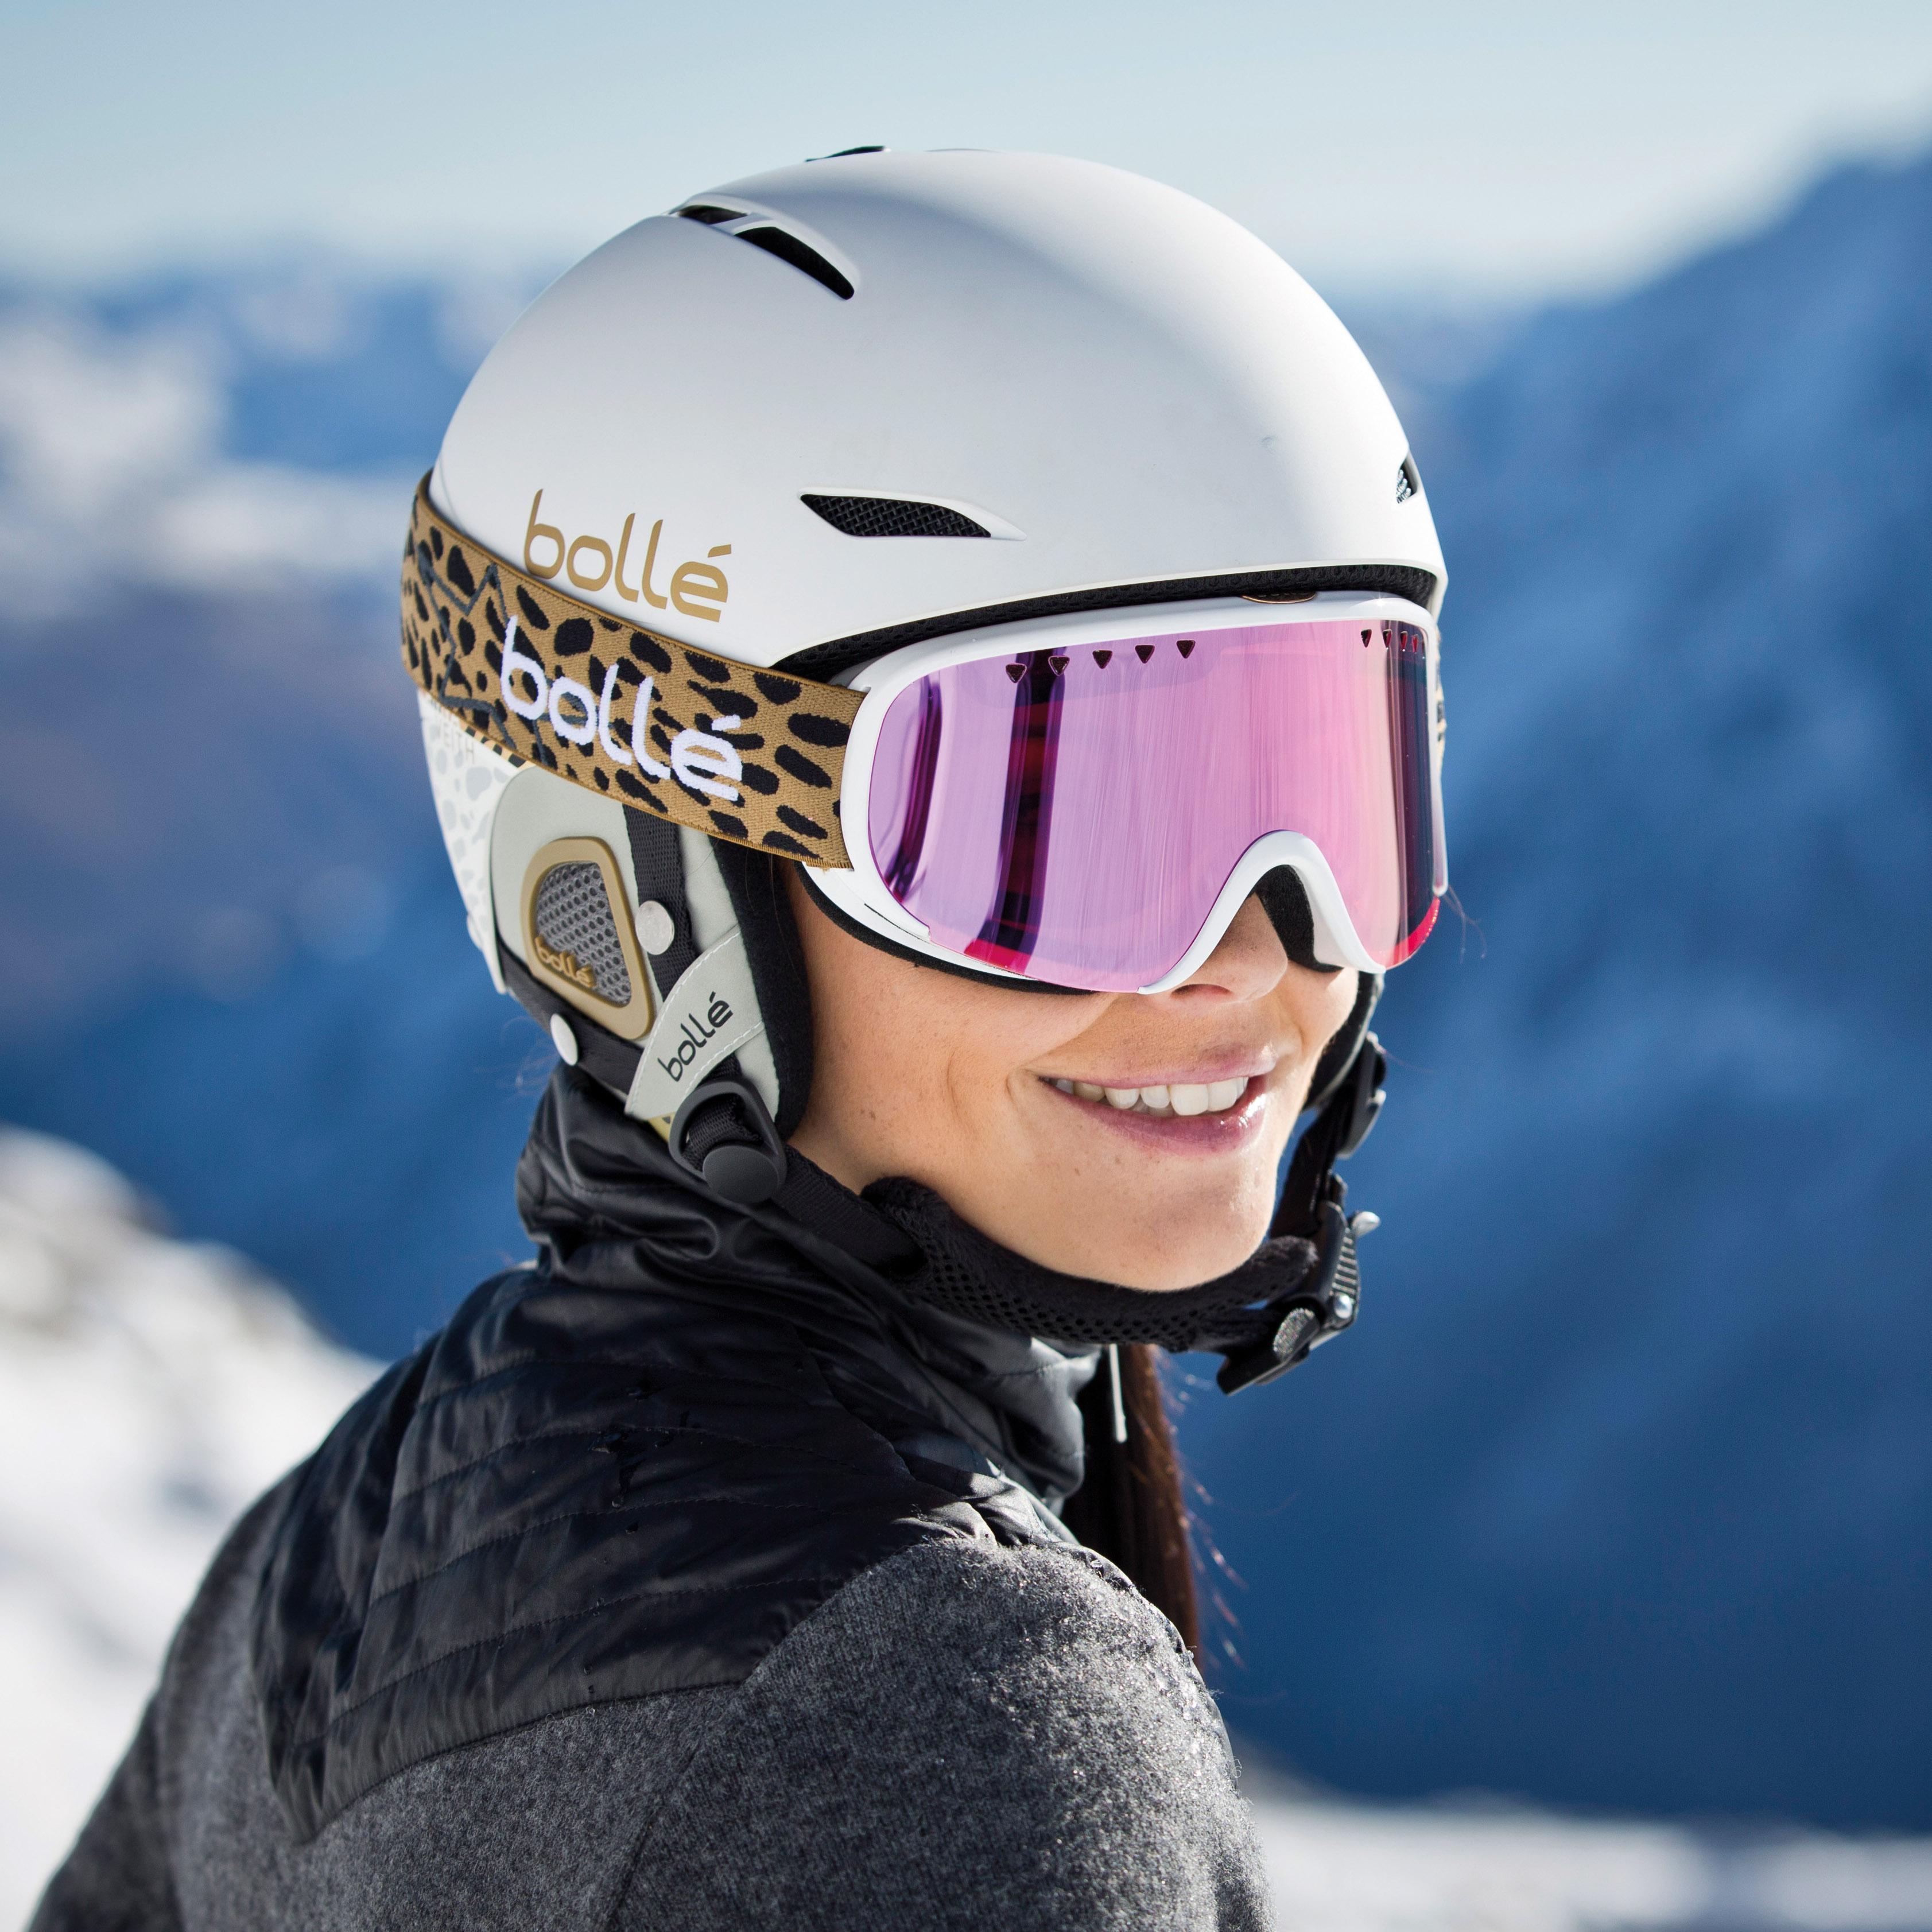 boll mojo masque de ski homme sports et loisirs. Black Bedroom Furniture Sets. Home Design Ideas